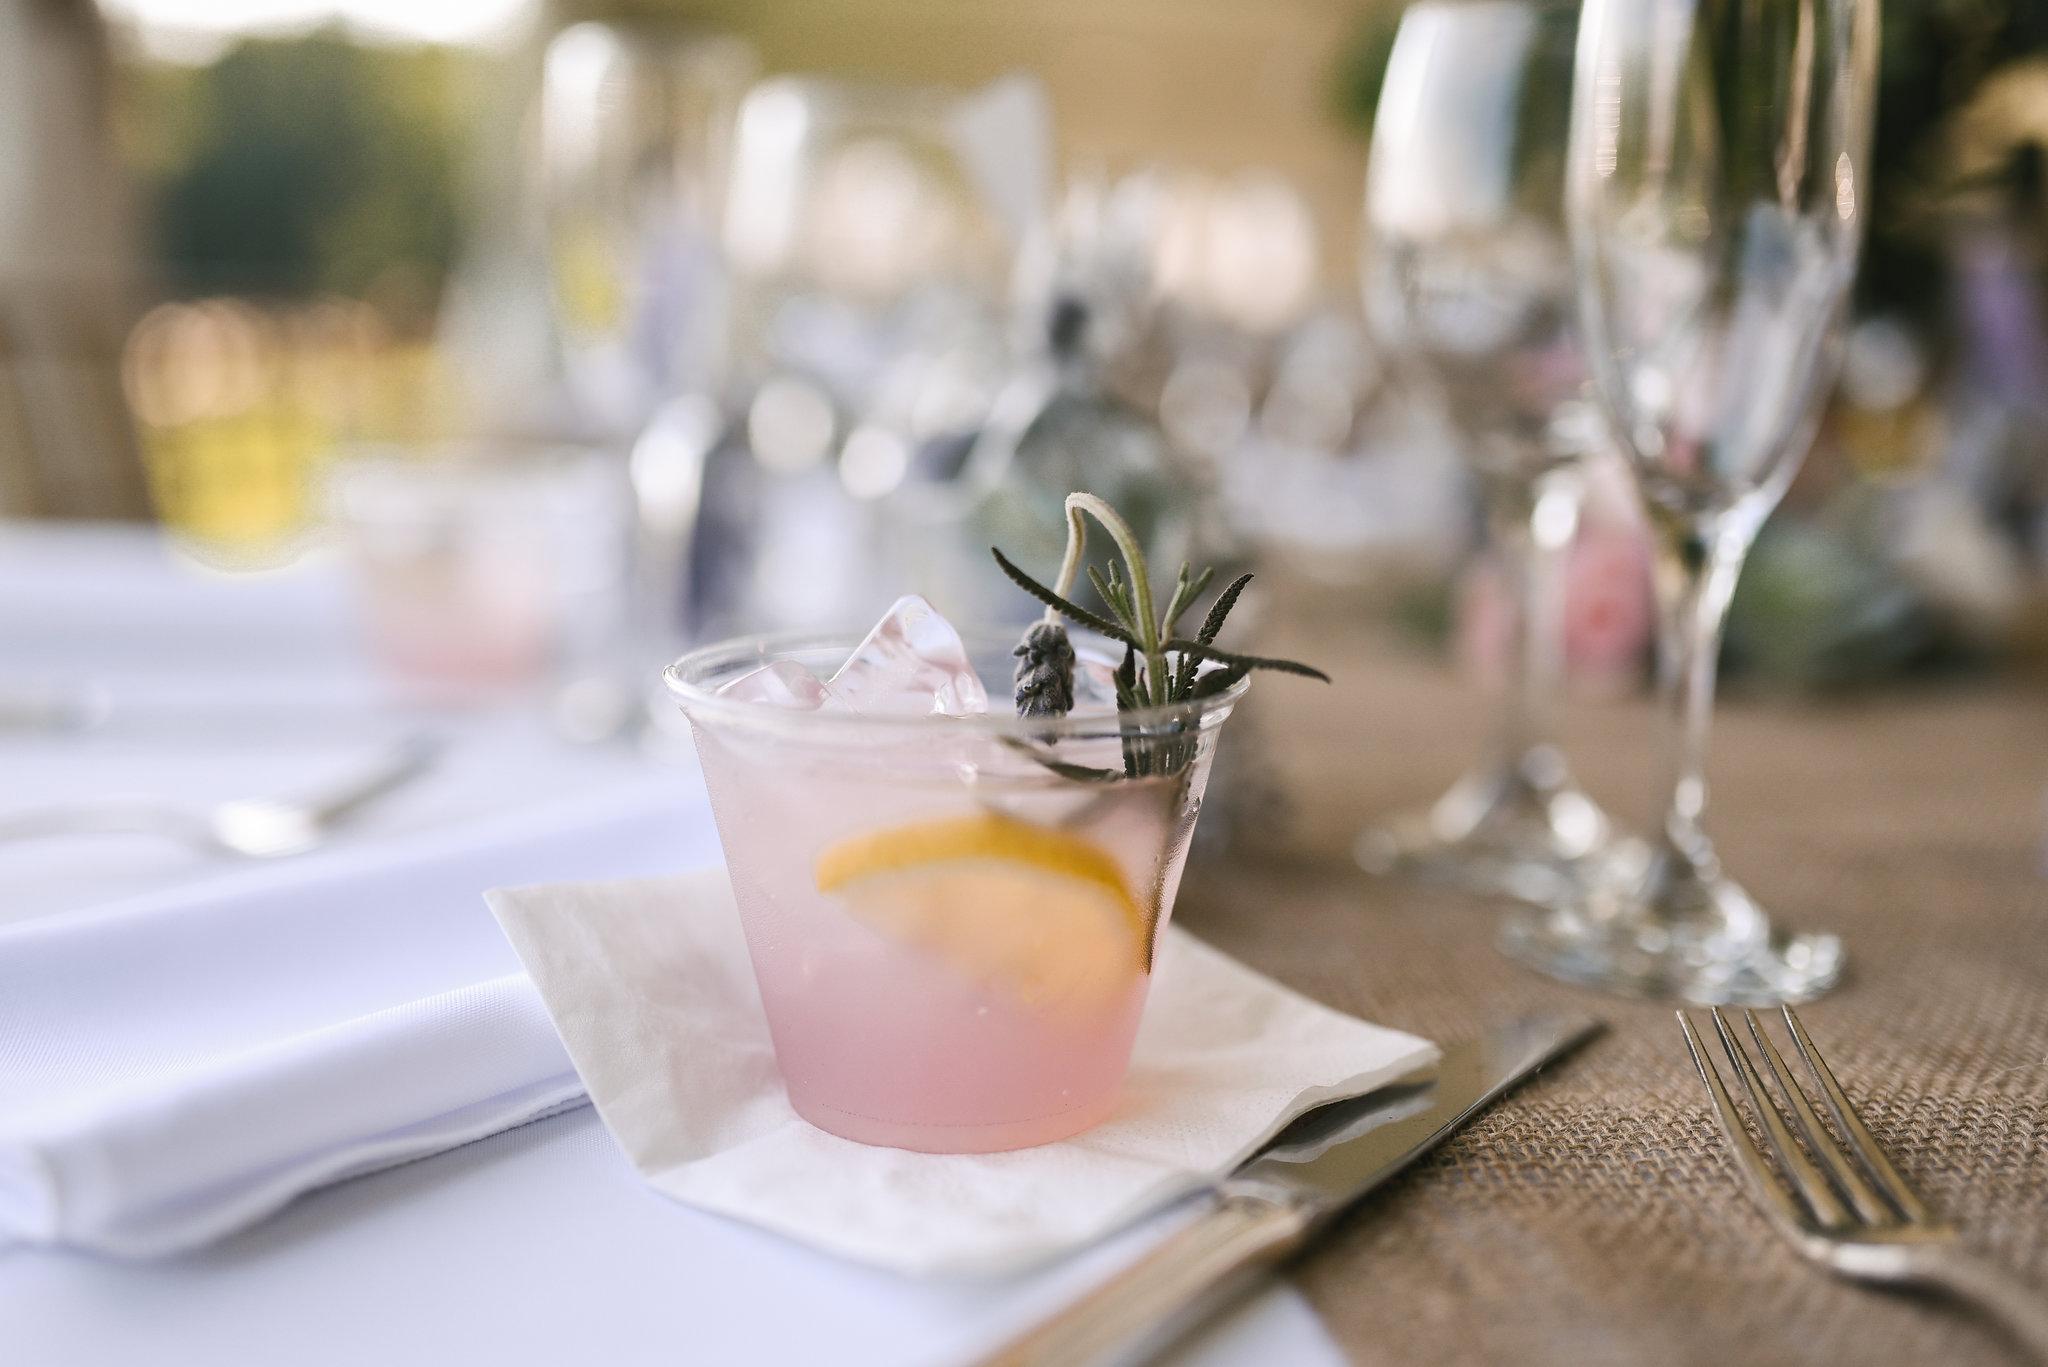 Maryland, Eastern Shore, Baltimore Wedding Photographer, Romantic, Boho, Backyard Wedding, Nature, Cocktails, Pink Mixed Drink at Reception